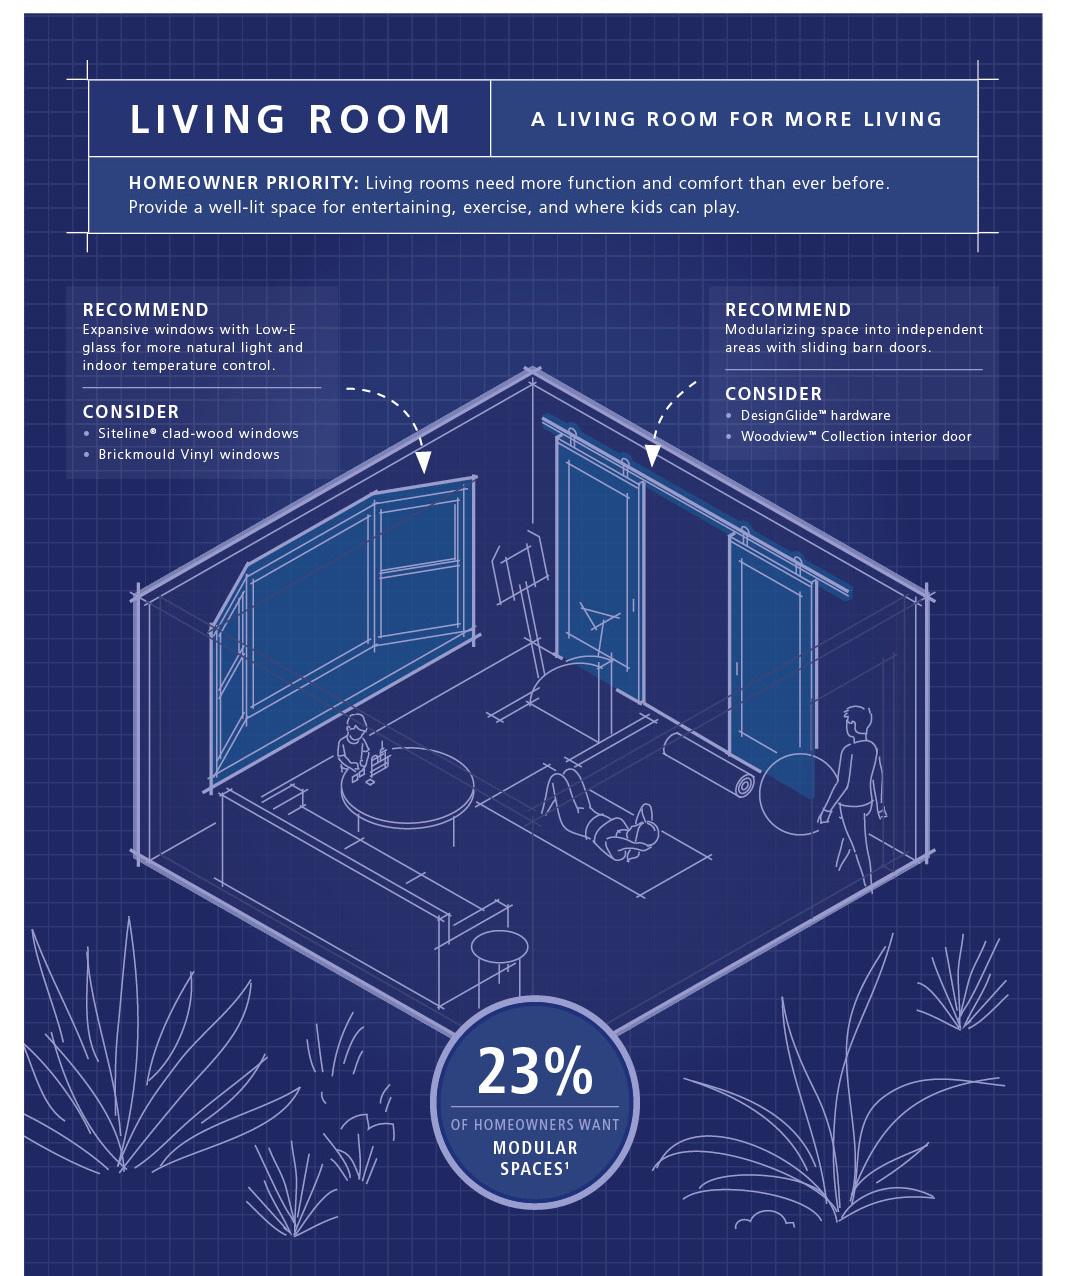 LivingRoom_remodeling